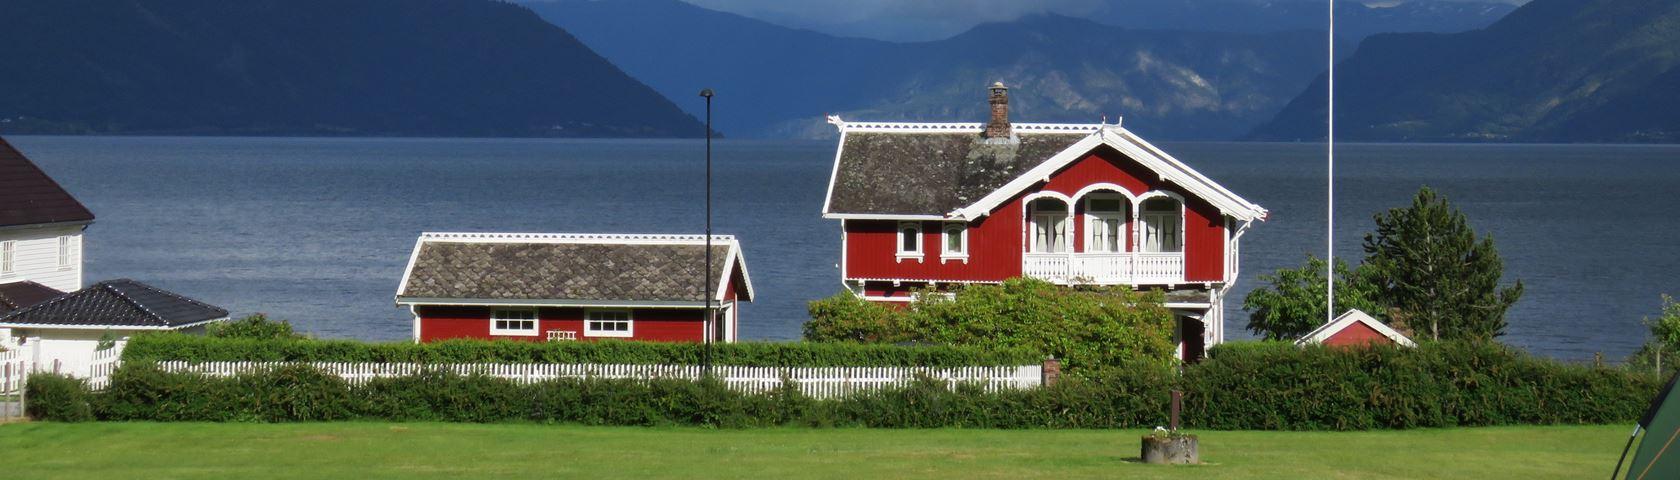 House at Balestrand Norway